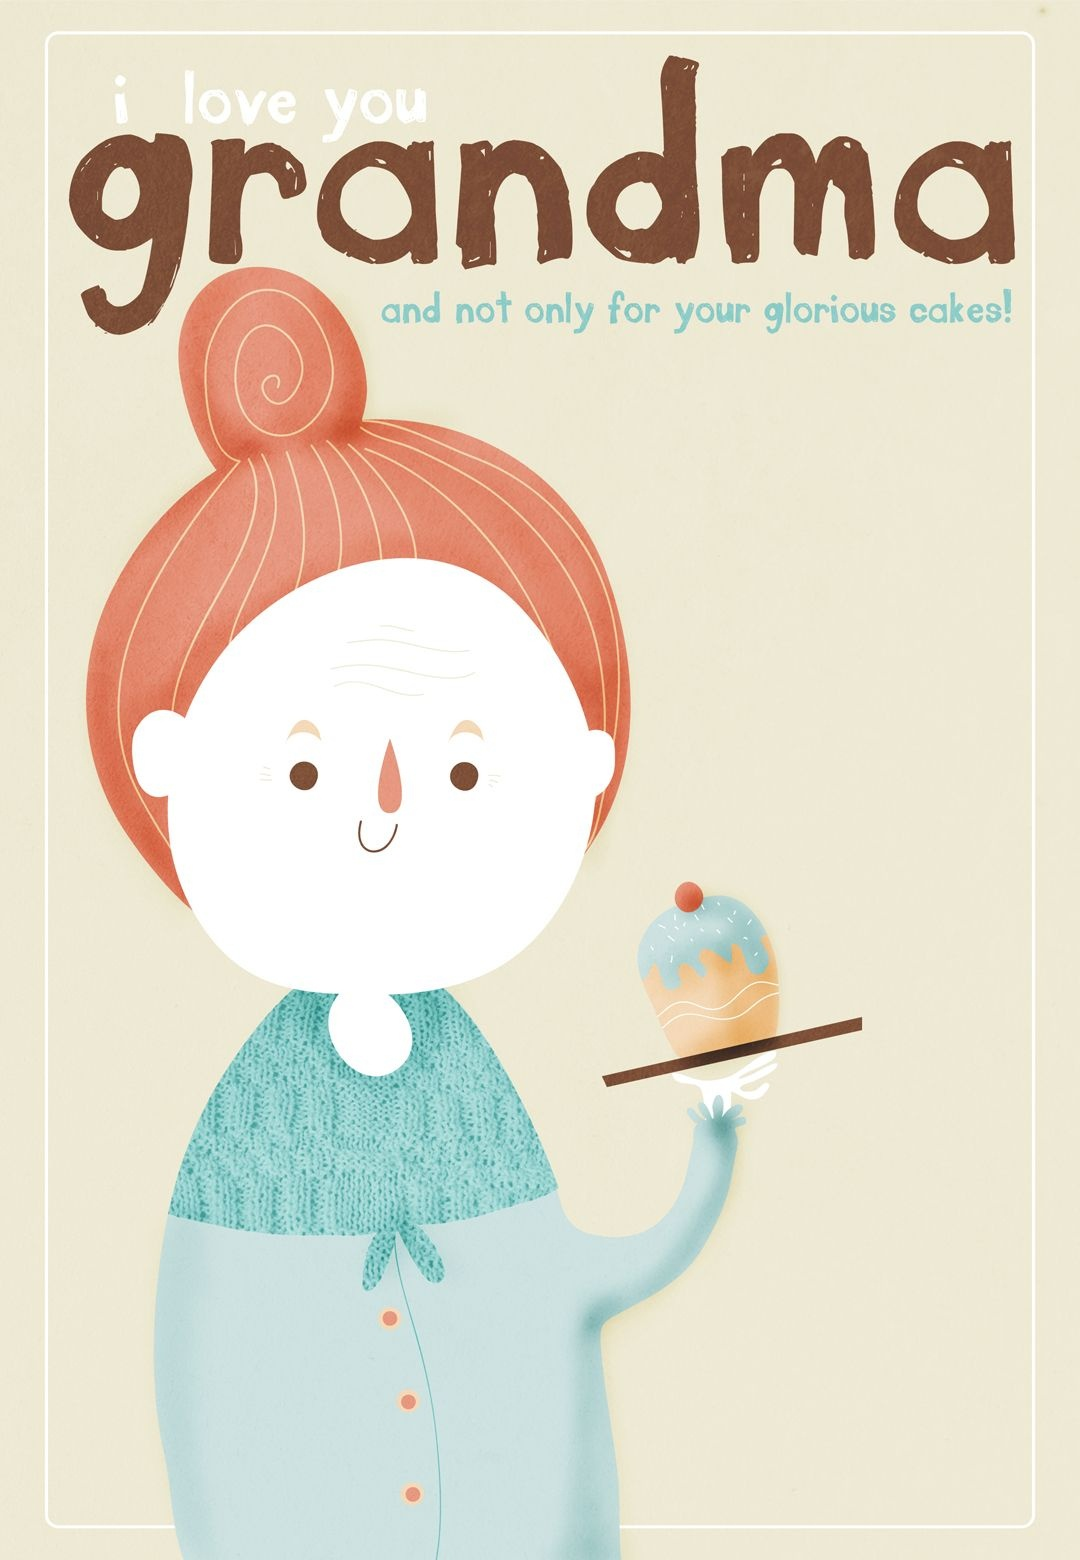 Free Printable I Love You Grandma Greeting Card | Grandparents Day - Christmas Cards For Grandparents Free Printable